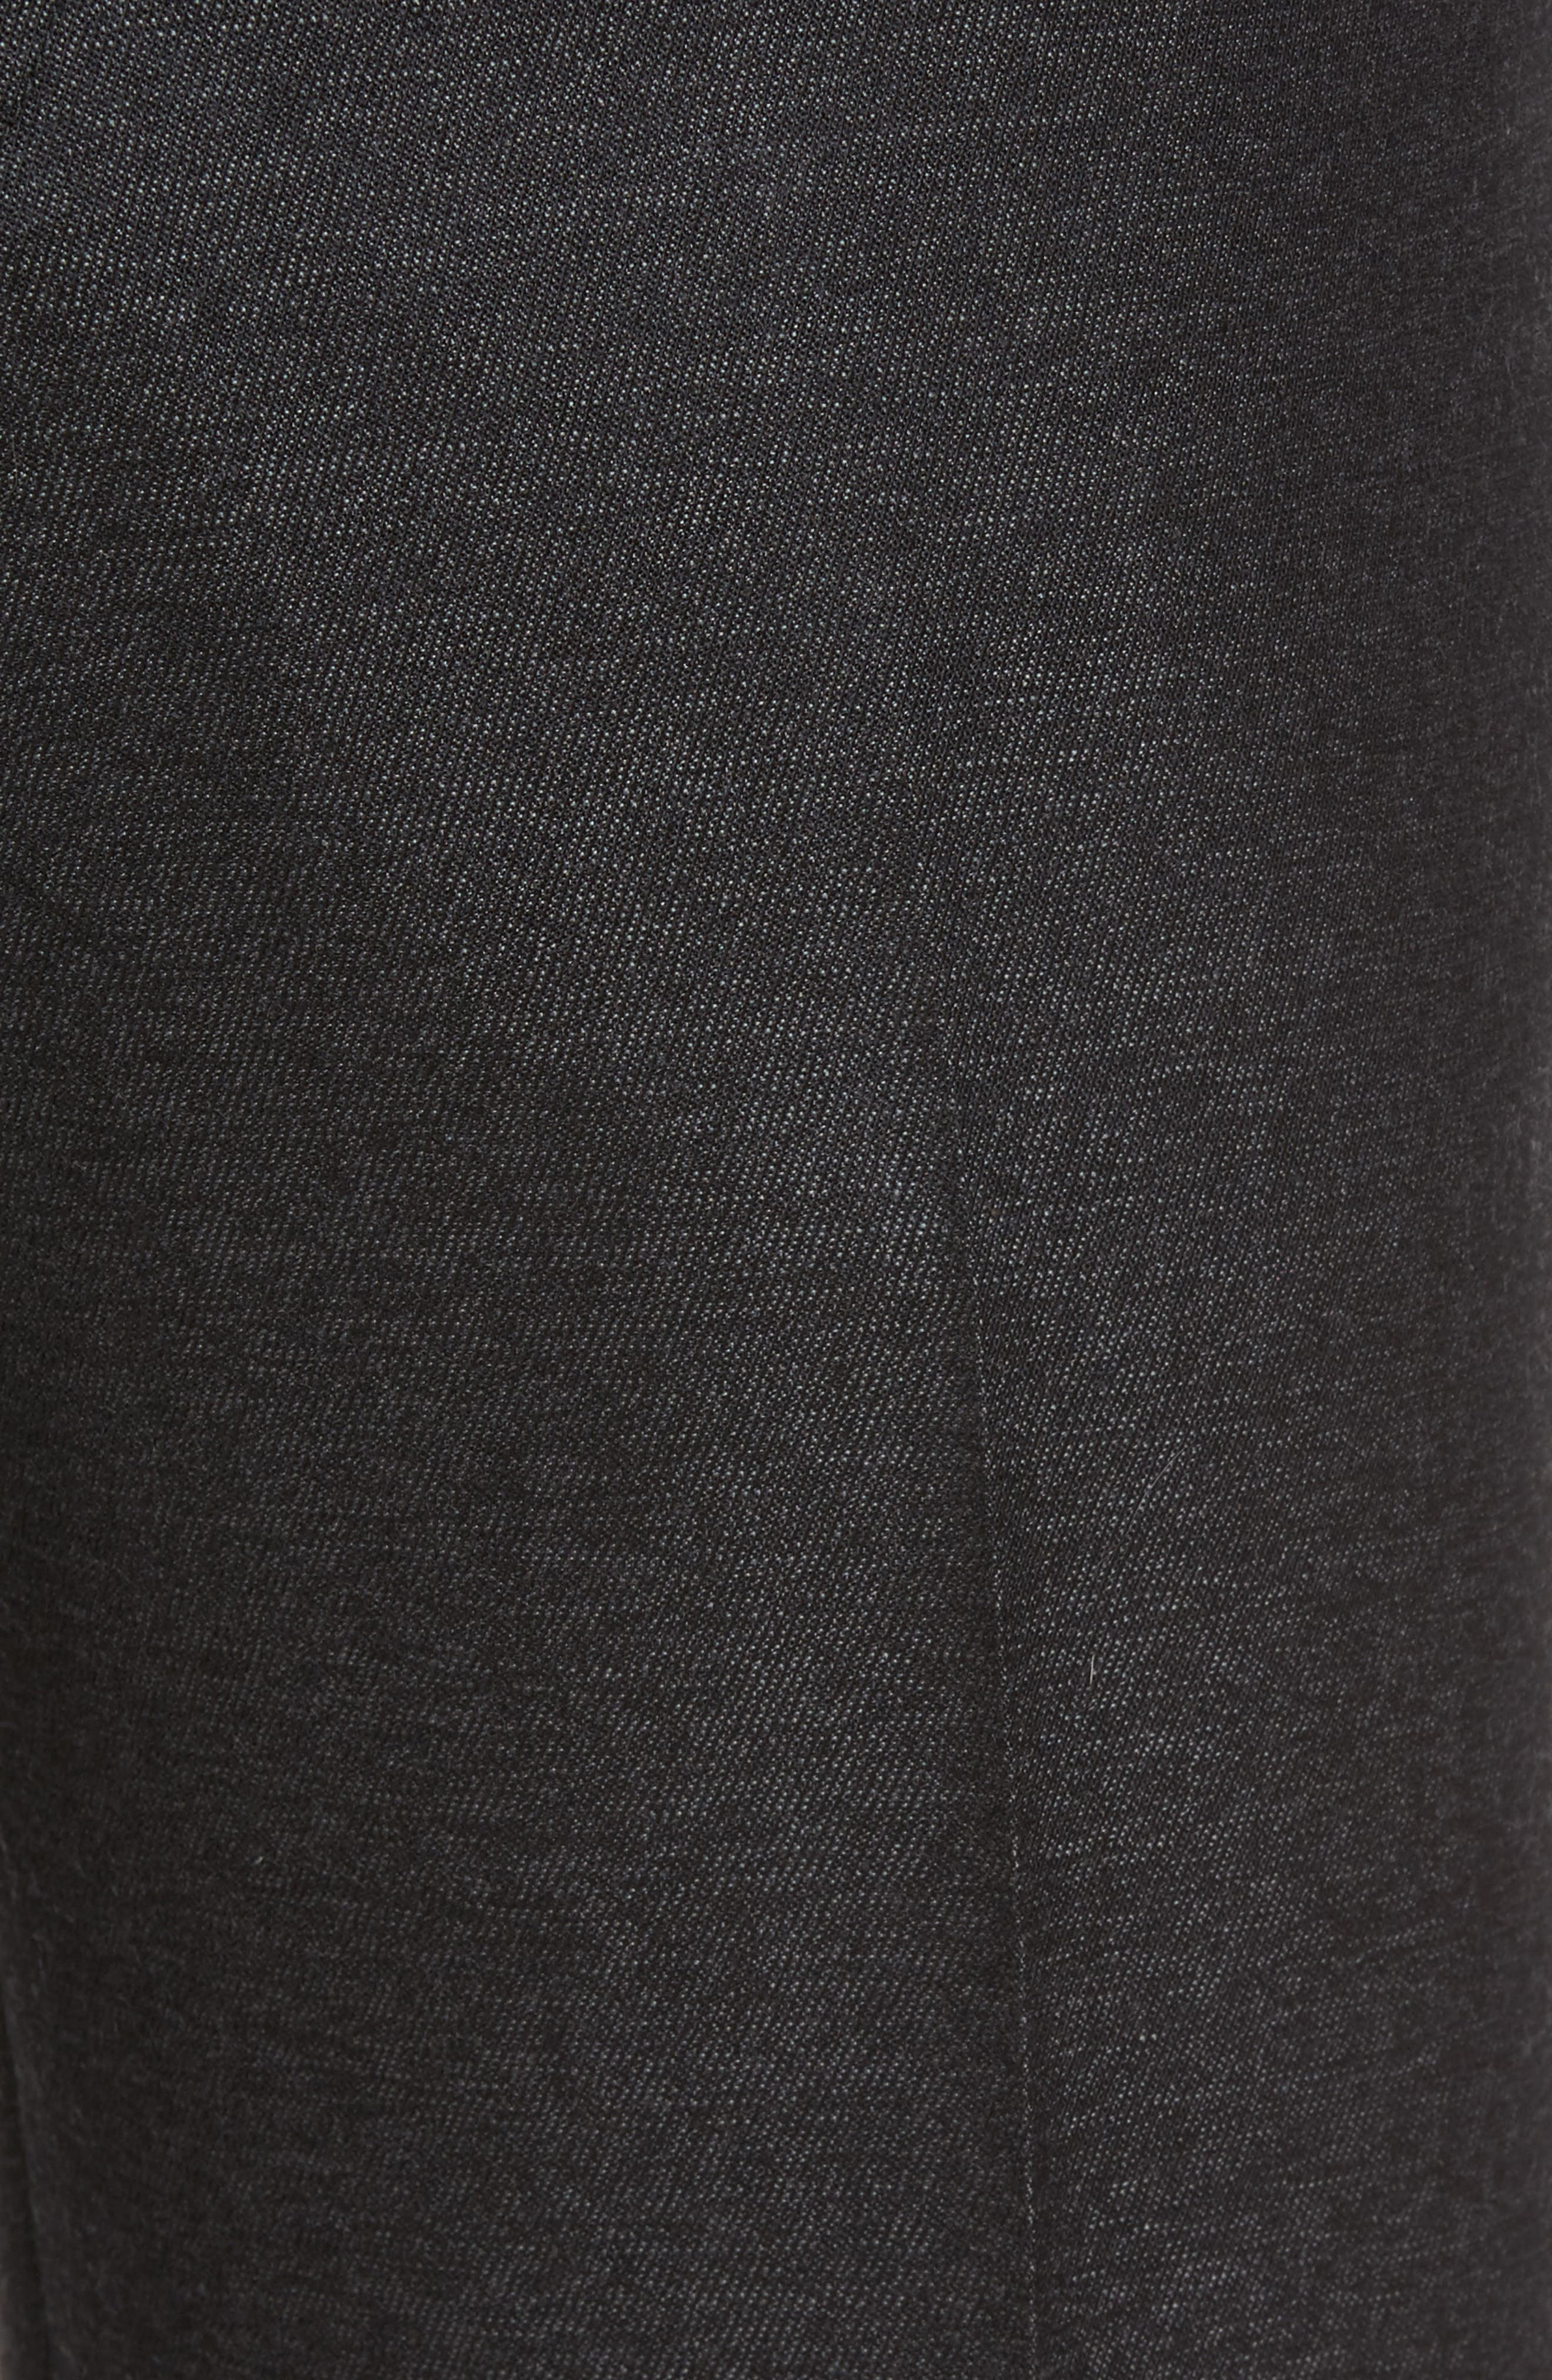 Sartorial Wool Five-Pocket Pants,                             Alternate thumbnail 5, color,                             001